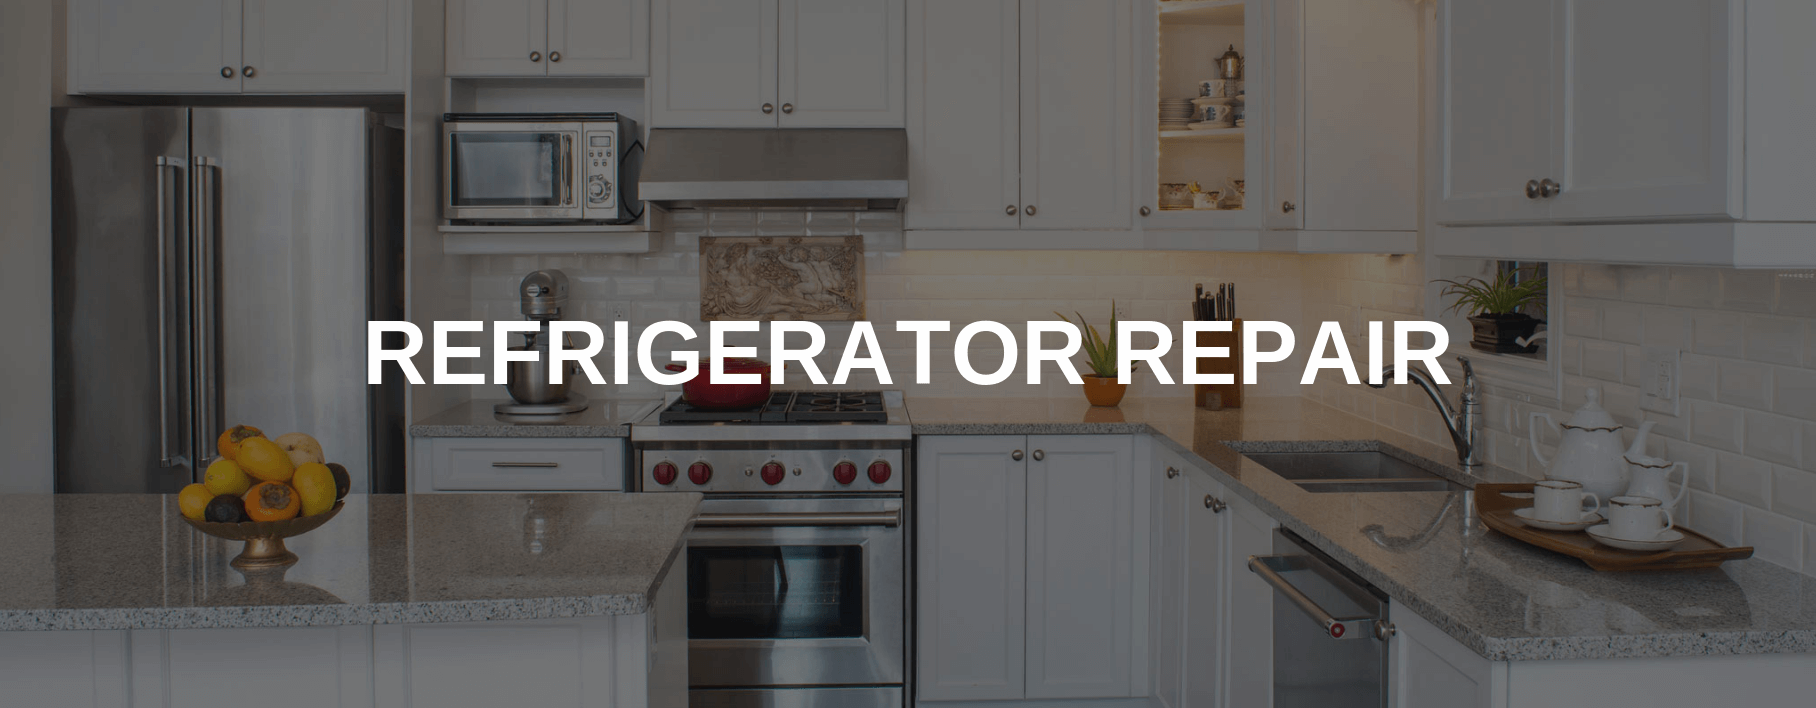 carollton refrigerator repair